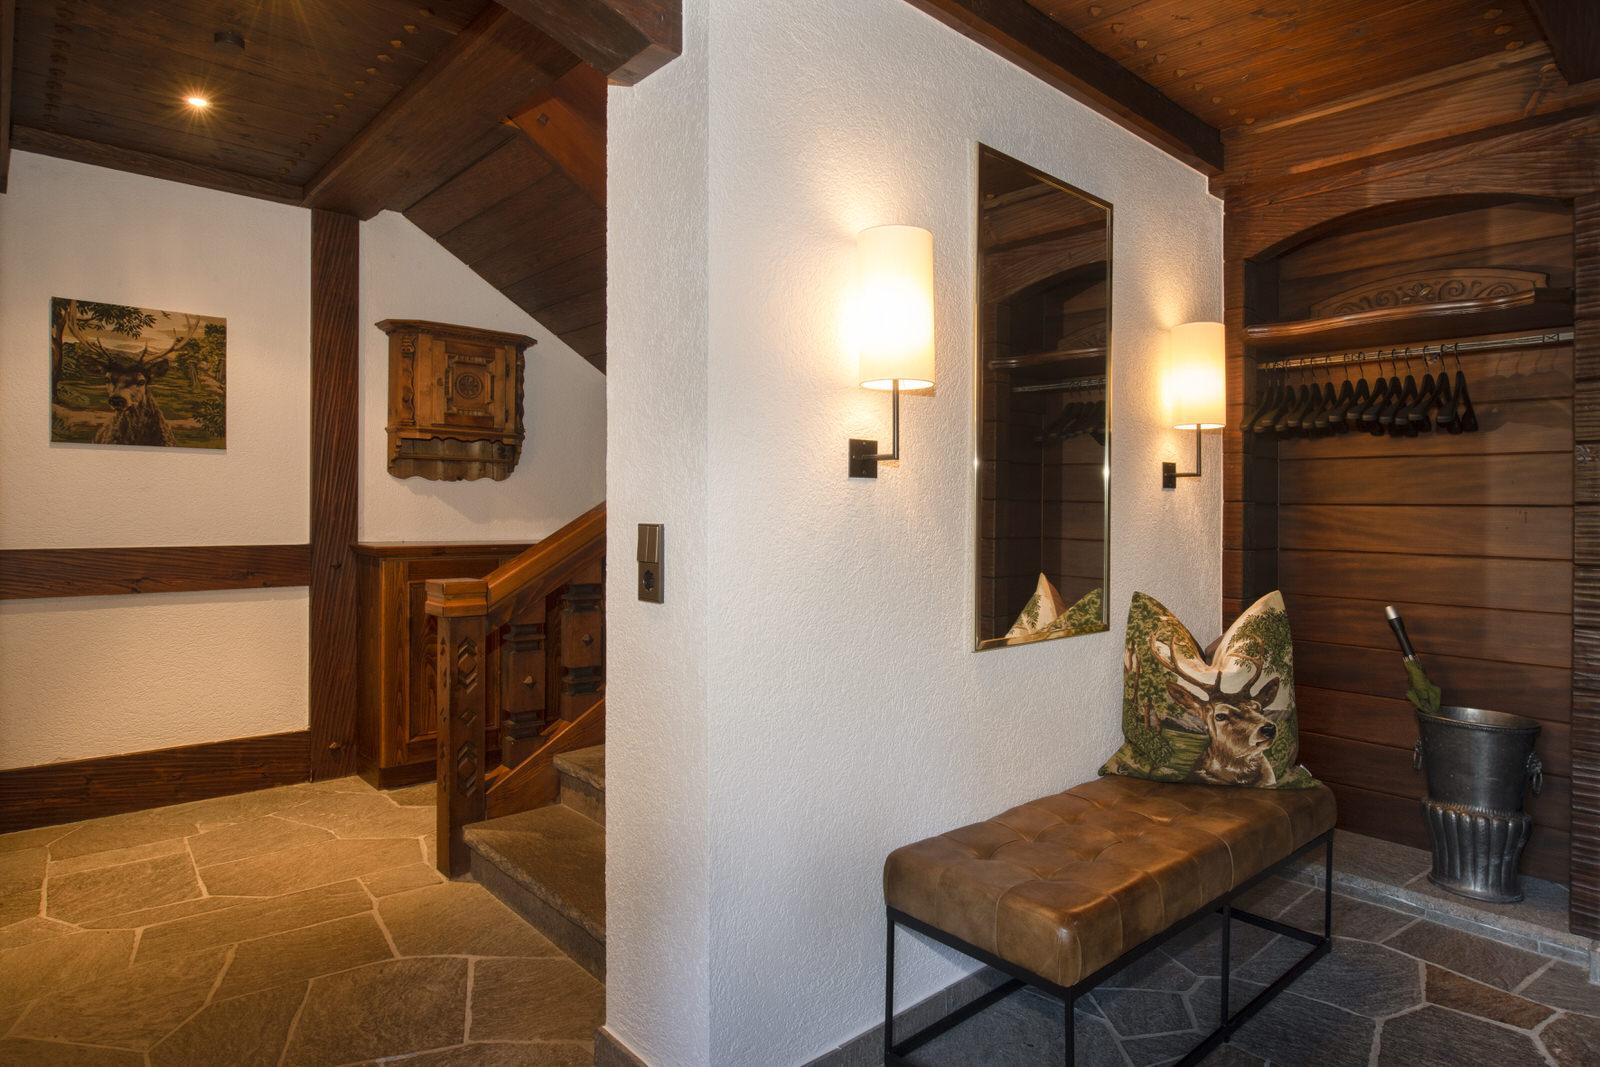 Rappakopf Forrest house in the Montafon - entrance corridor